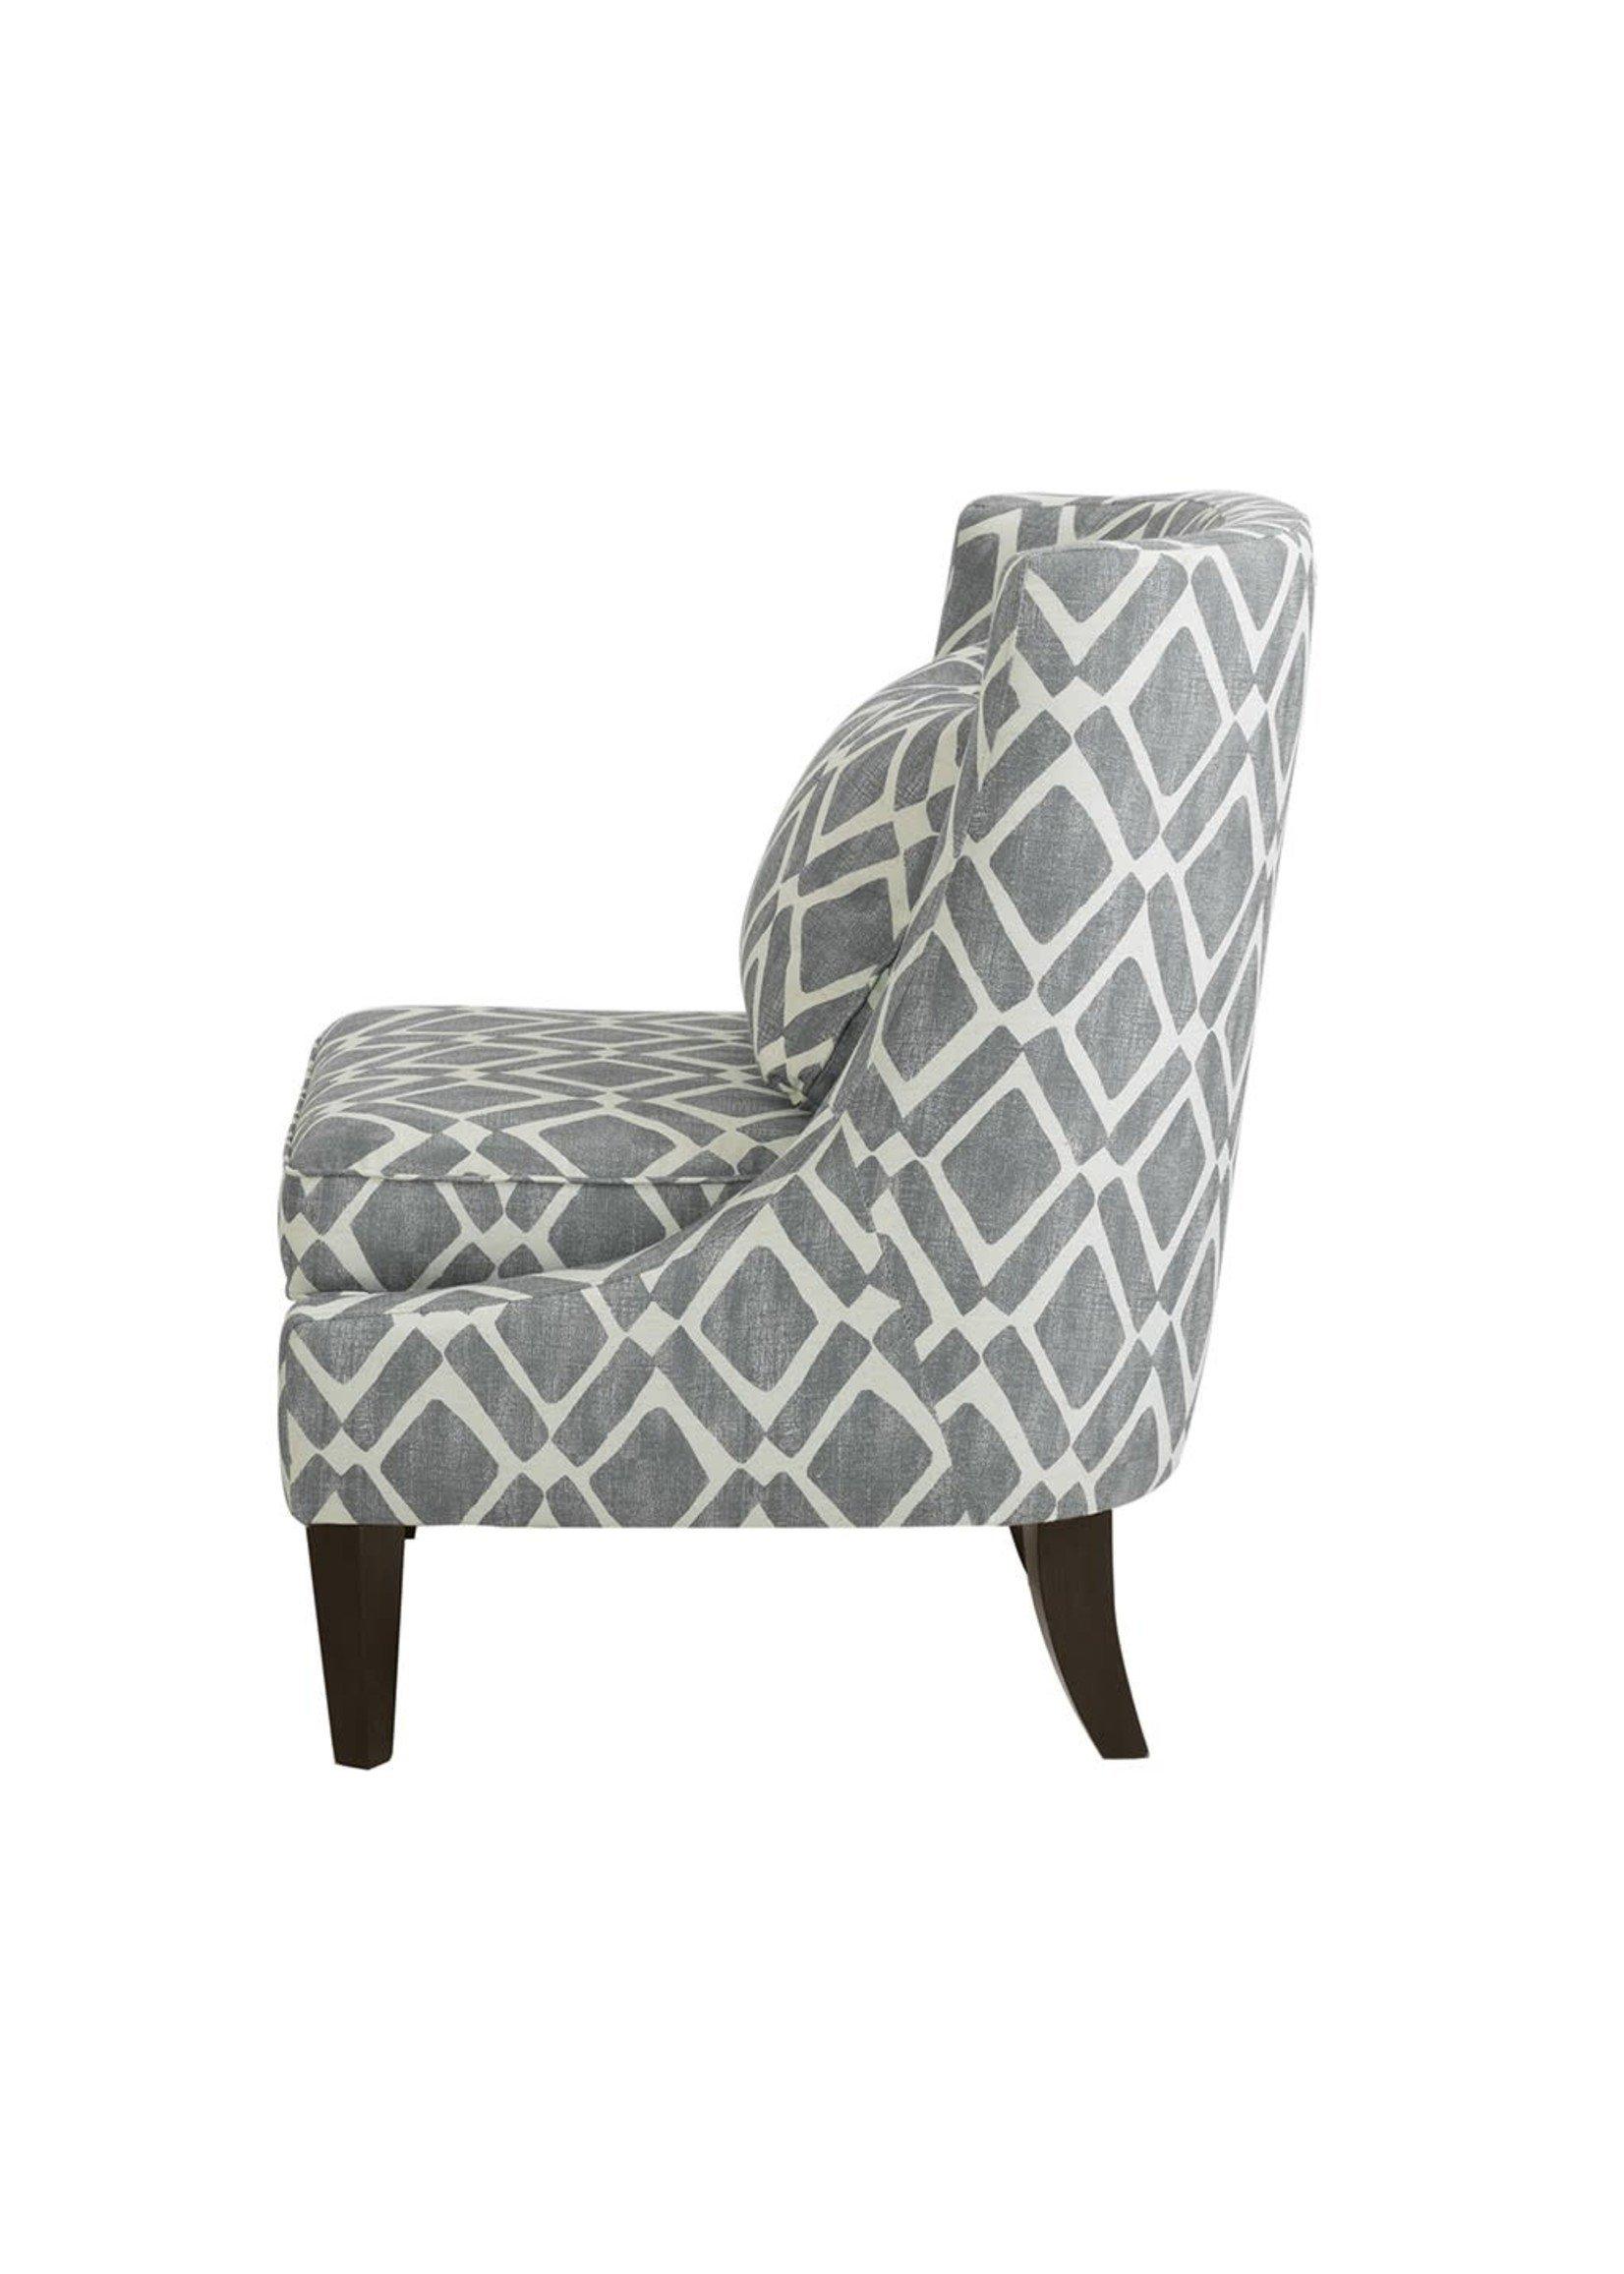 Olliix Waverly Swoop Arm Chair Grey